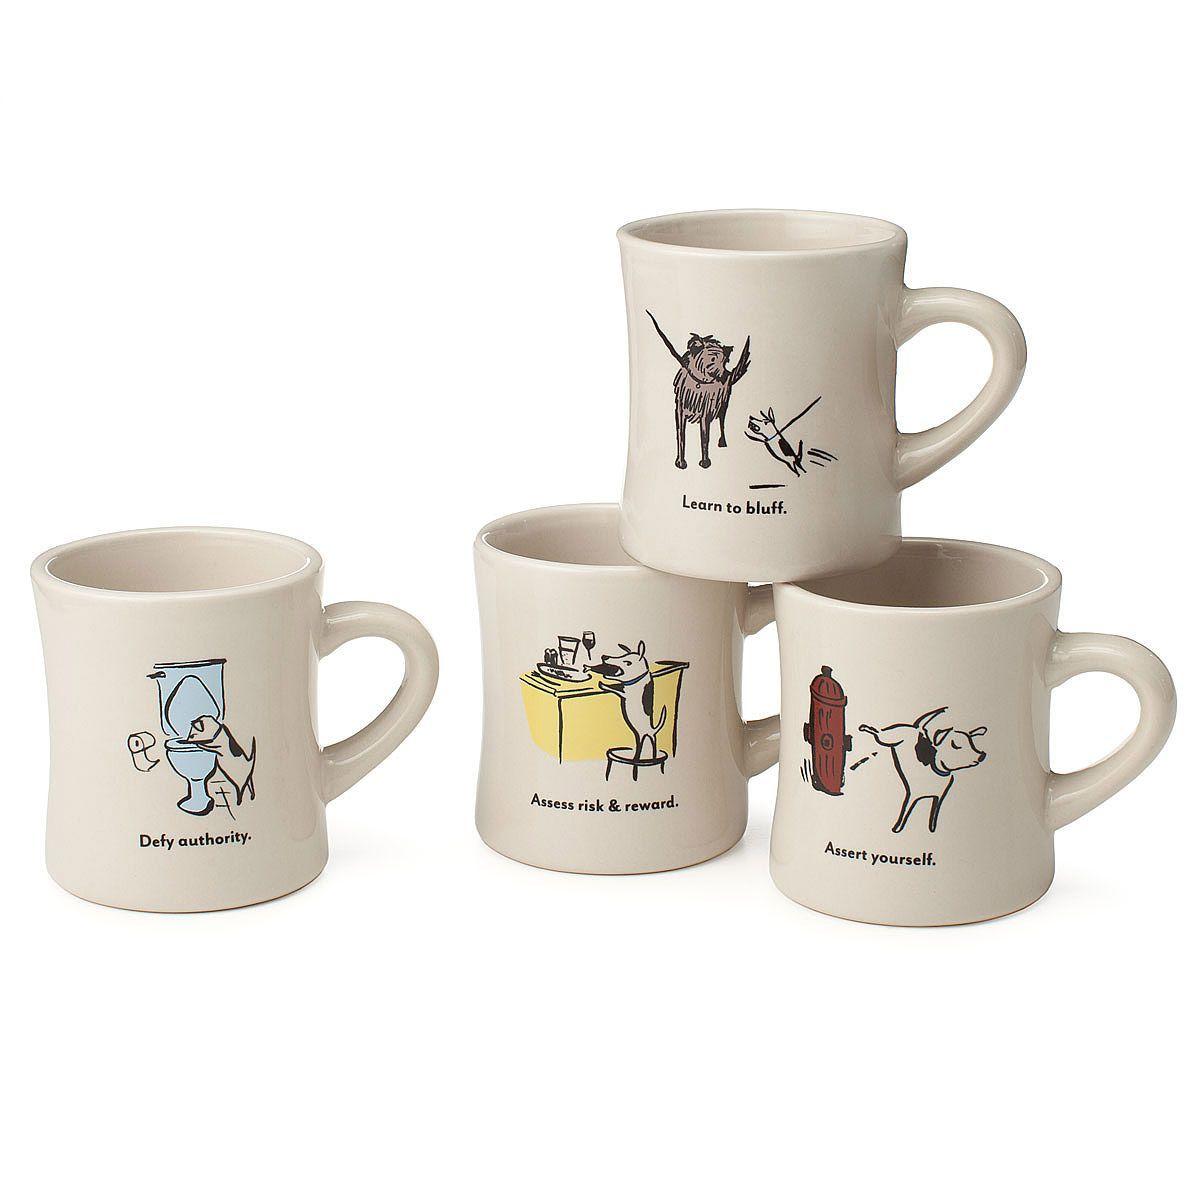 Bad Dog Wisdom Diner Mugs - Set of 4   dog glasses, pet, dog lover gift   UncommonGoods